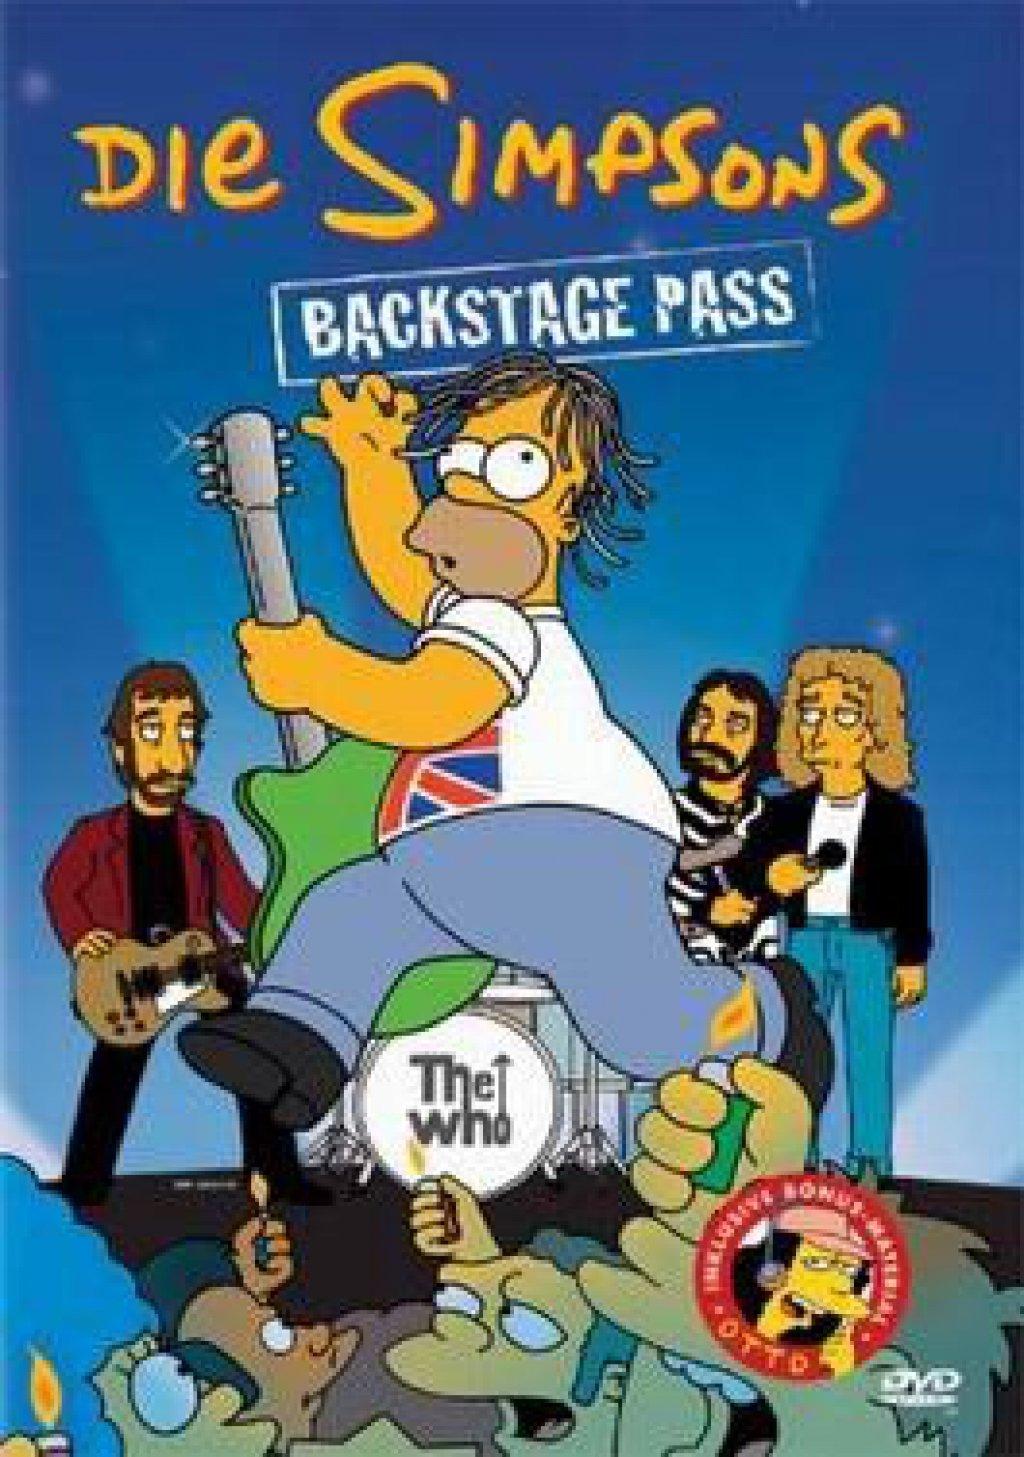 Die Simpsons - Backstage Pass (DVD)